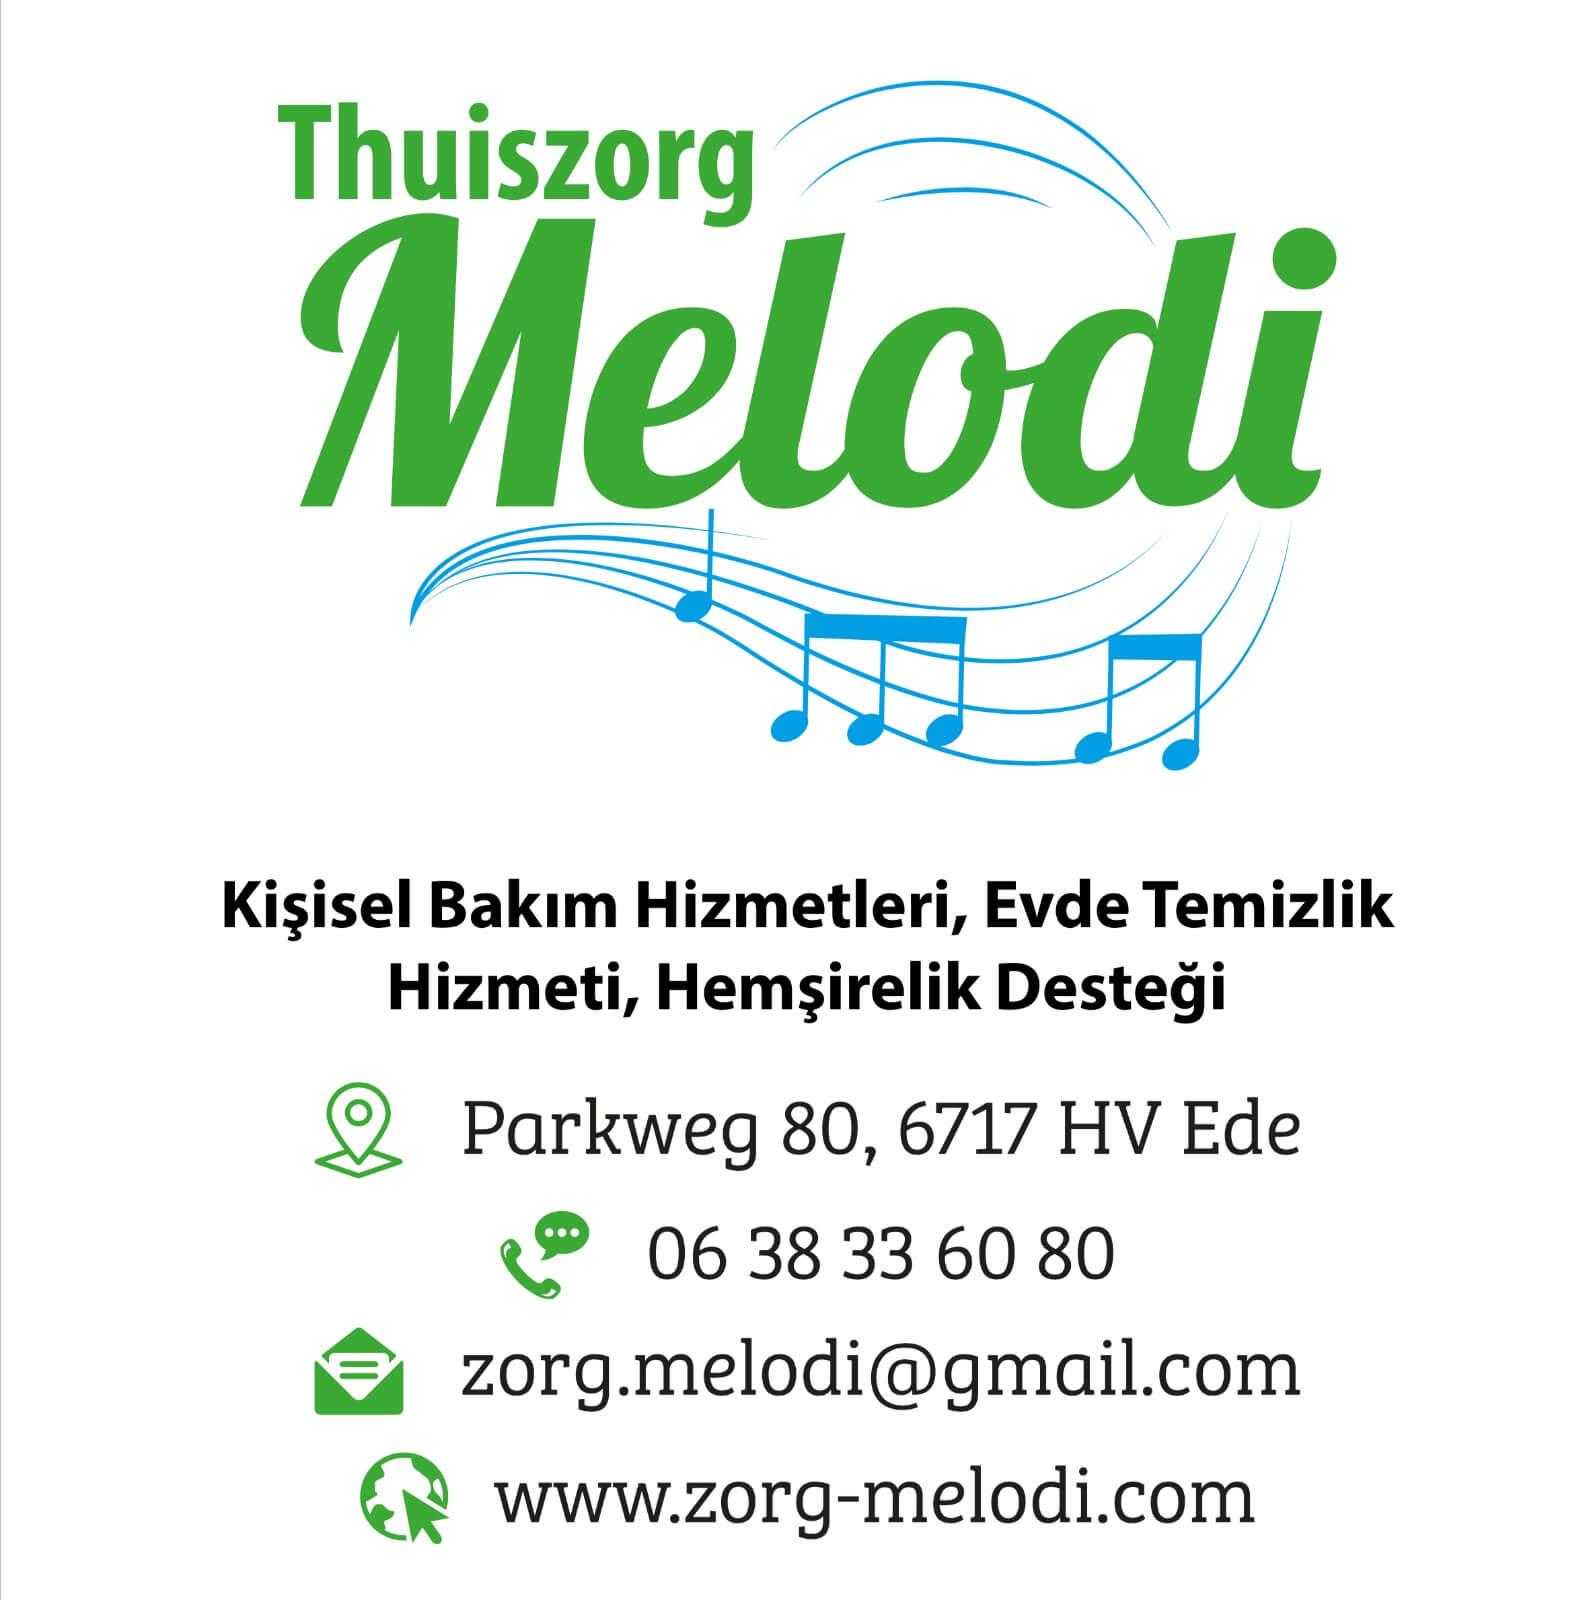 reklam-thuiszorg-melodi-nieuw